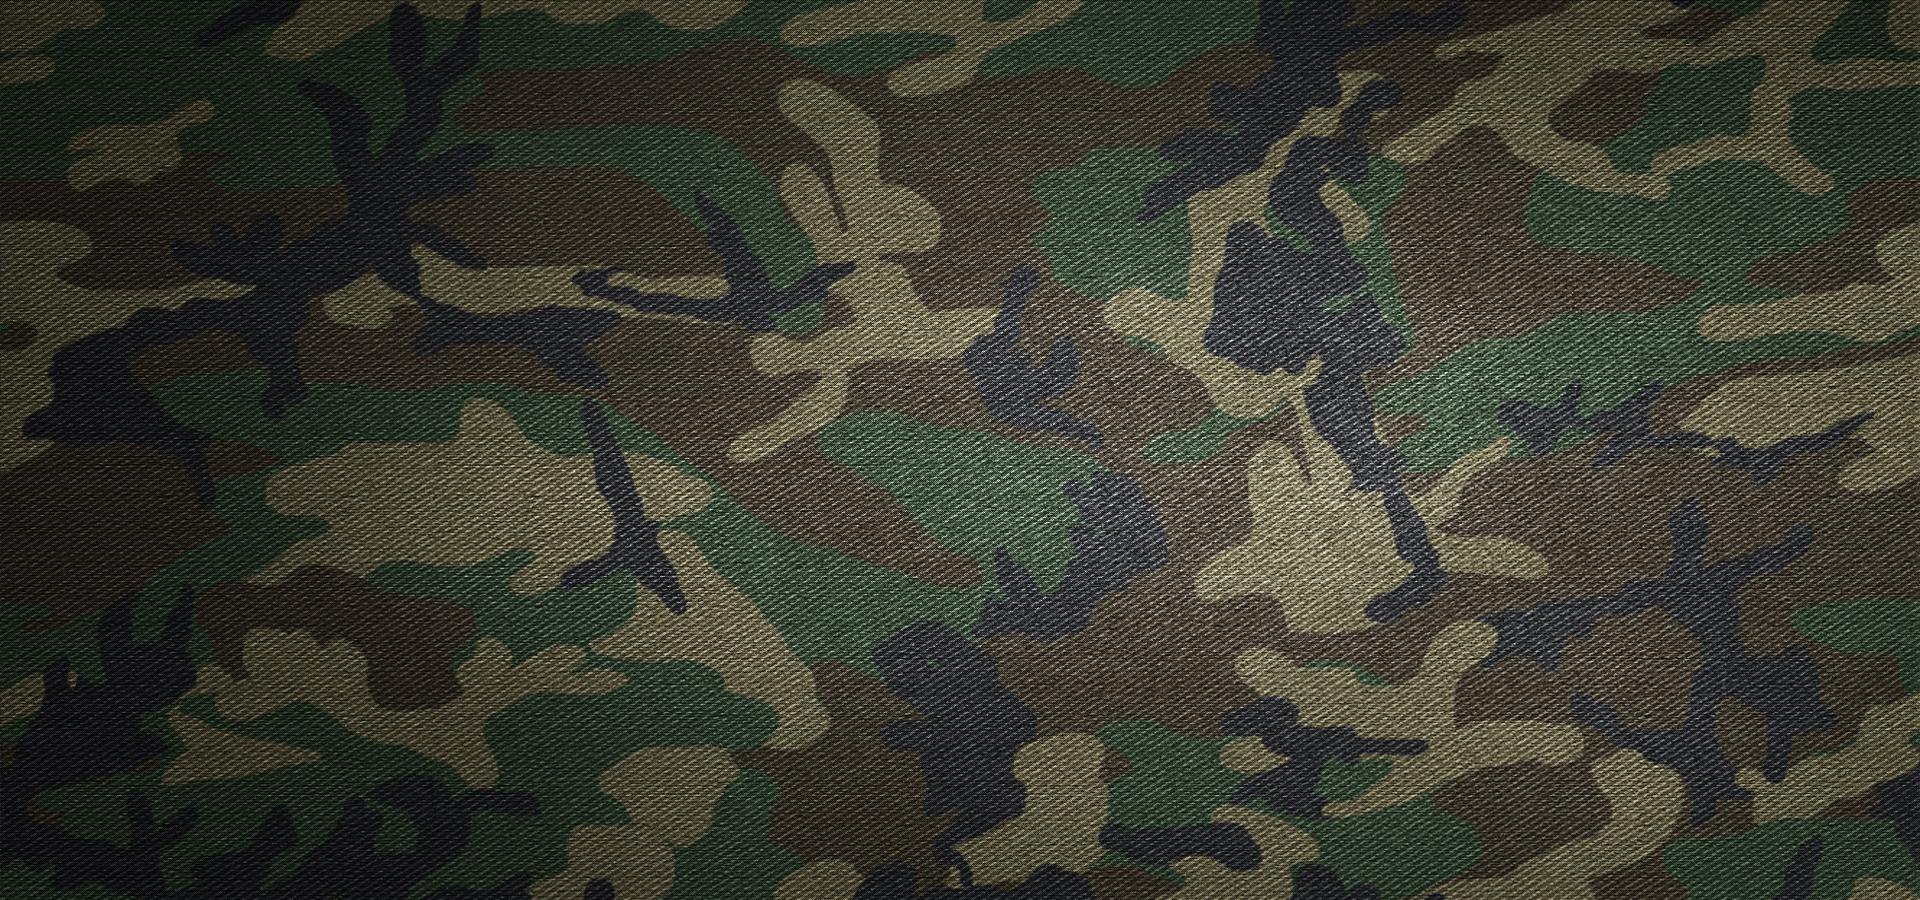 Camouflage Pattern Background Image Camouflage Pattern